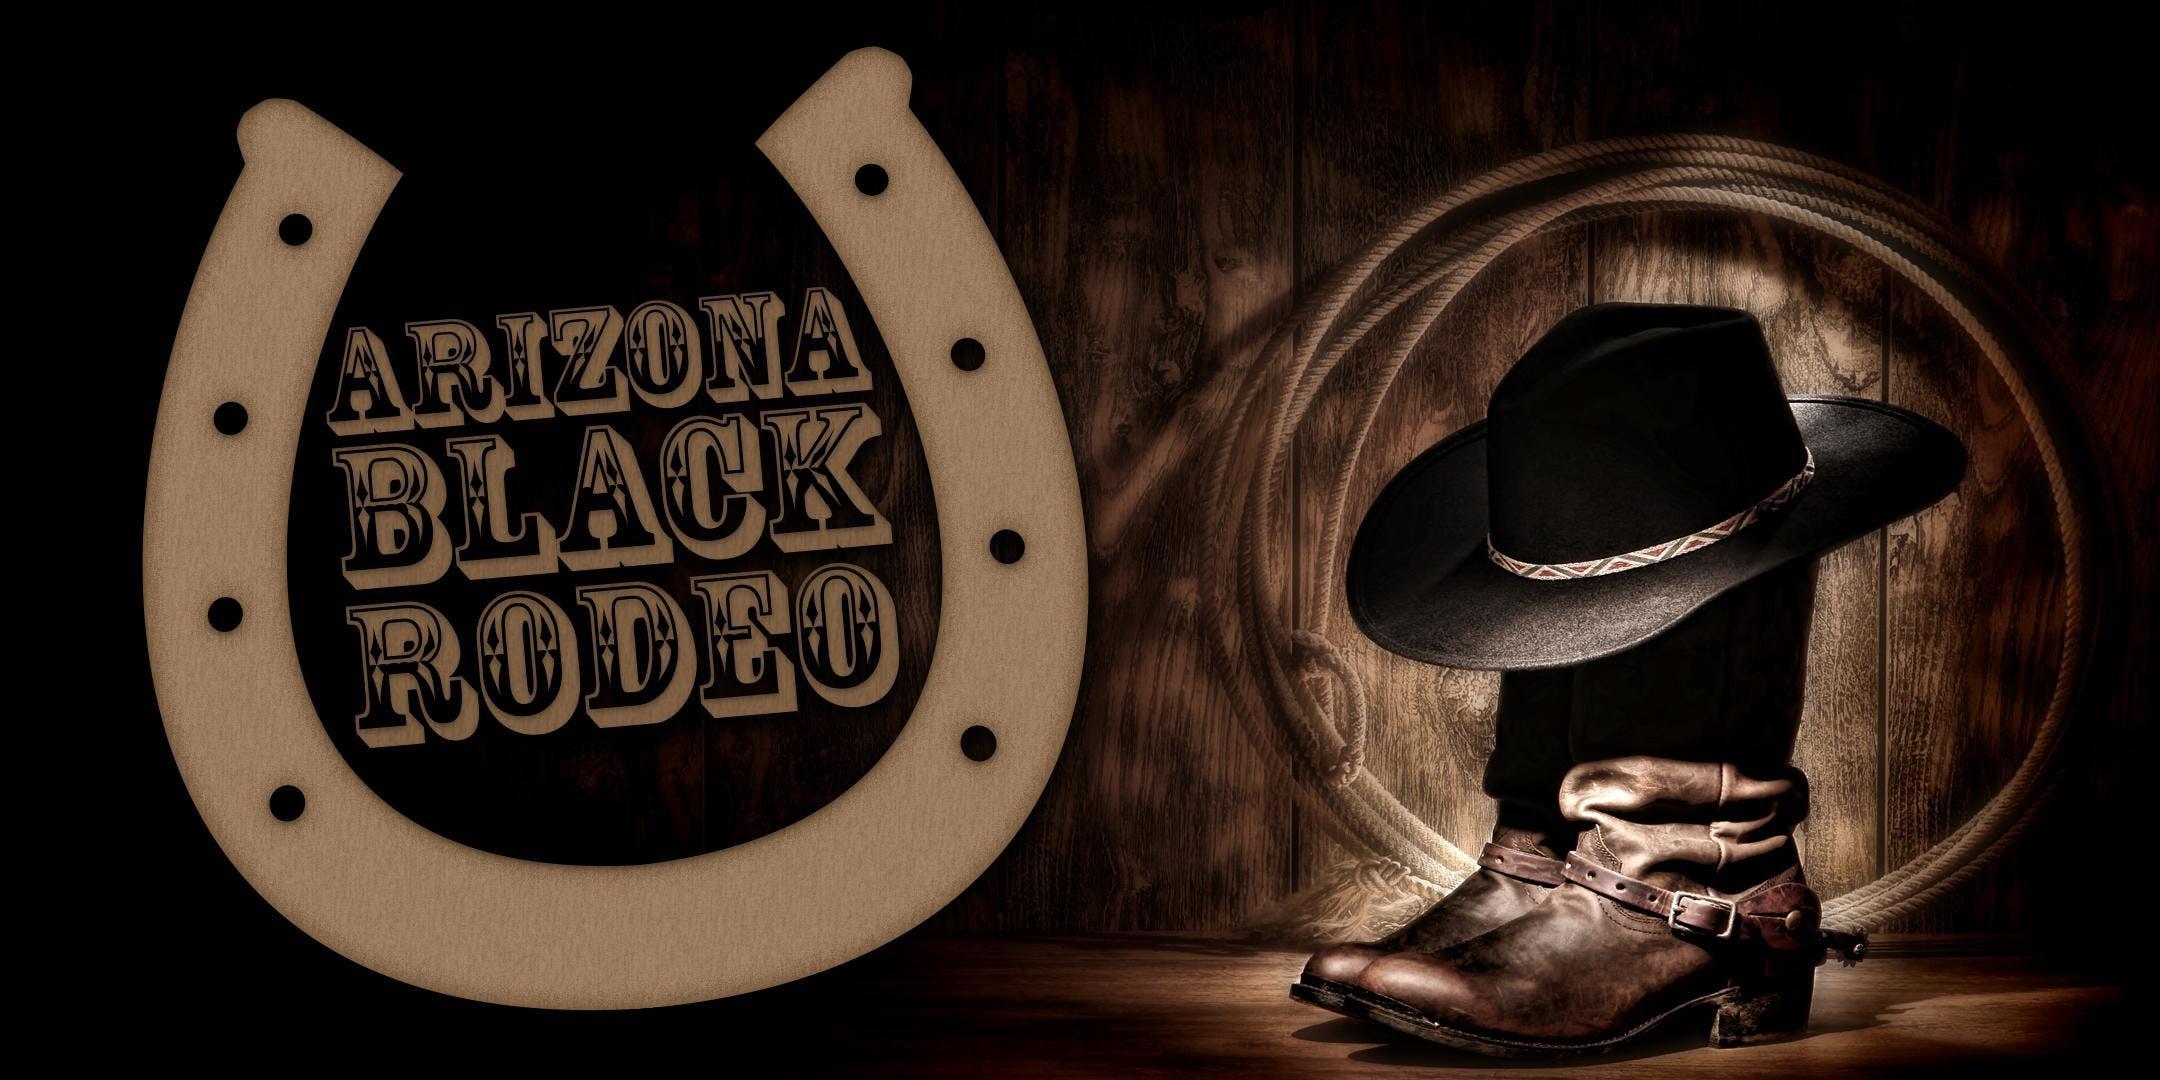 ARIZONA BLACK RODEO 2019